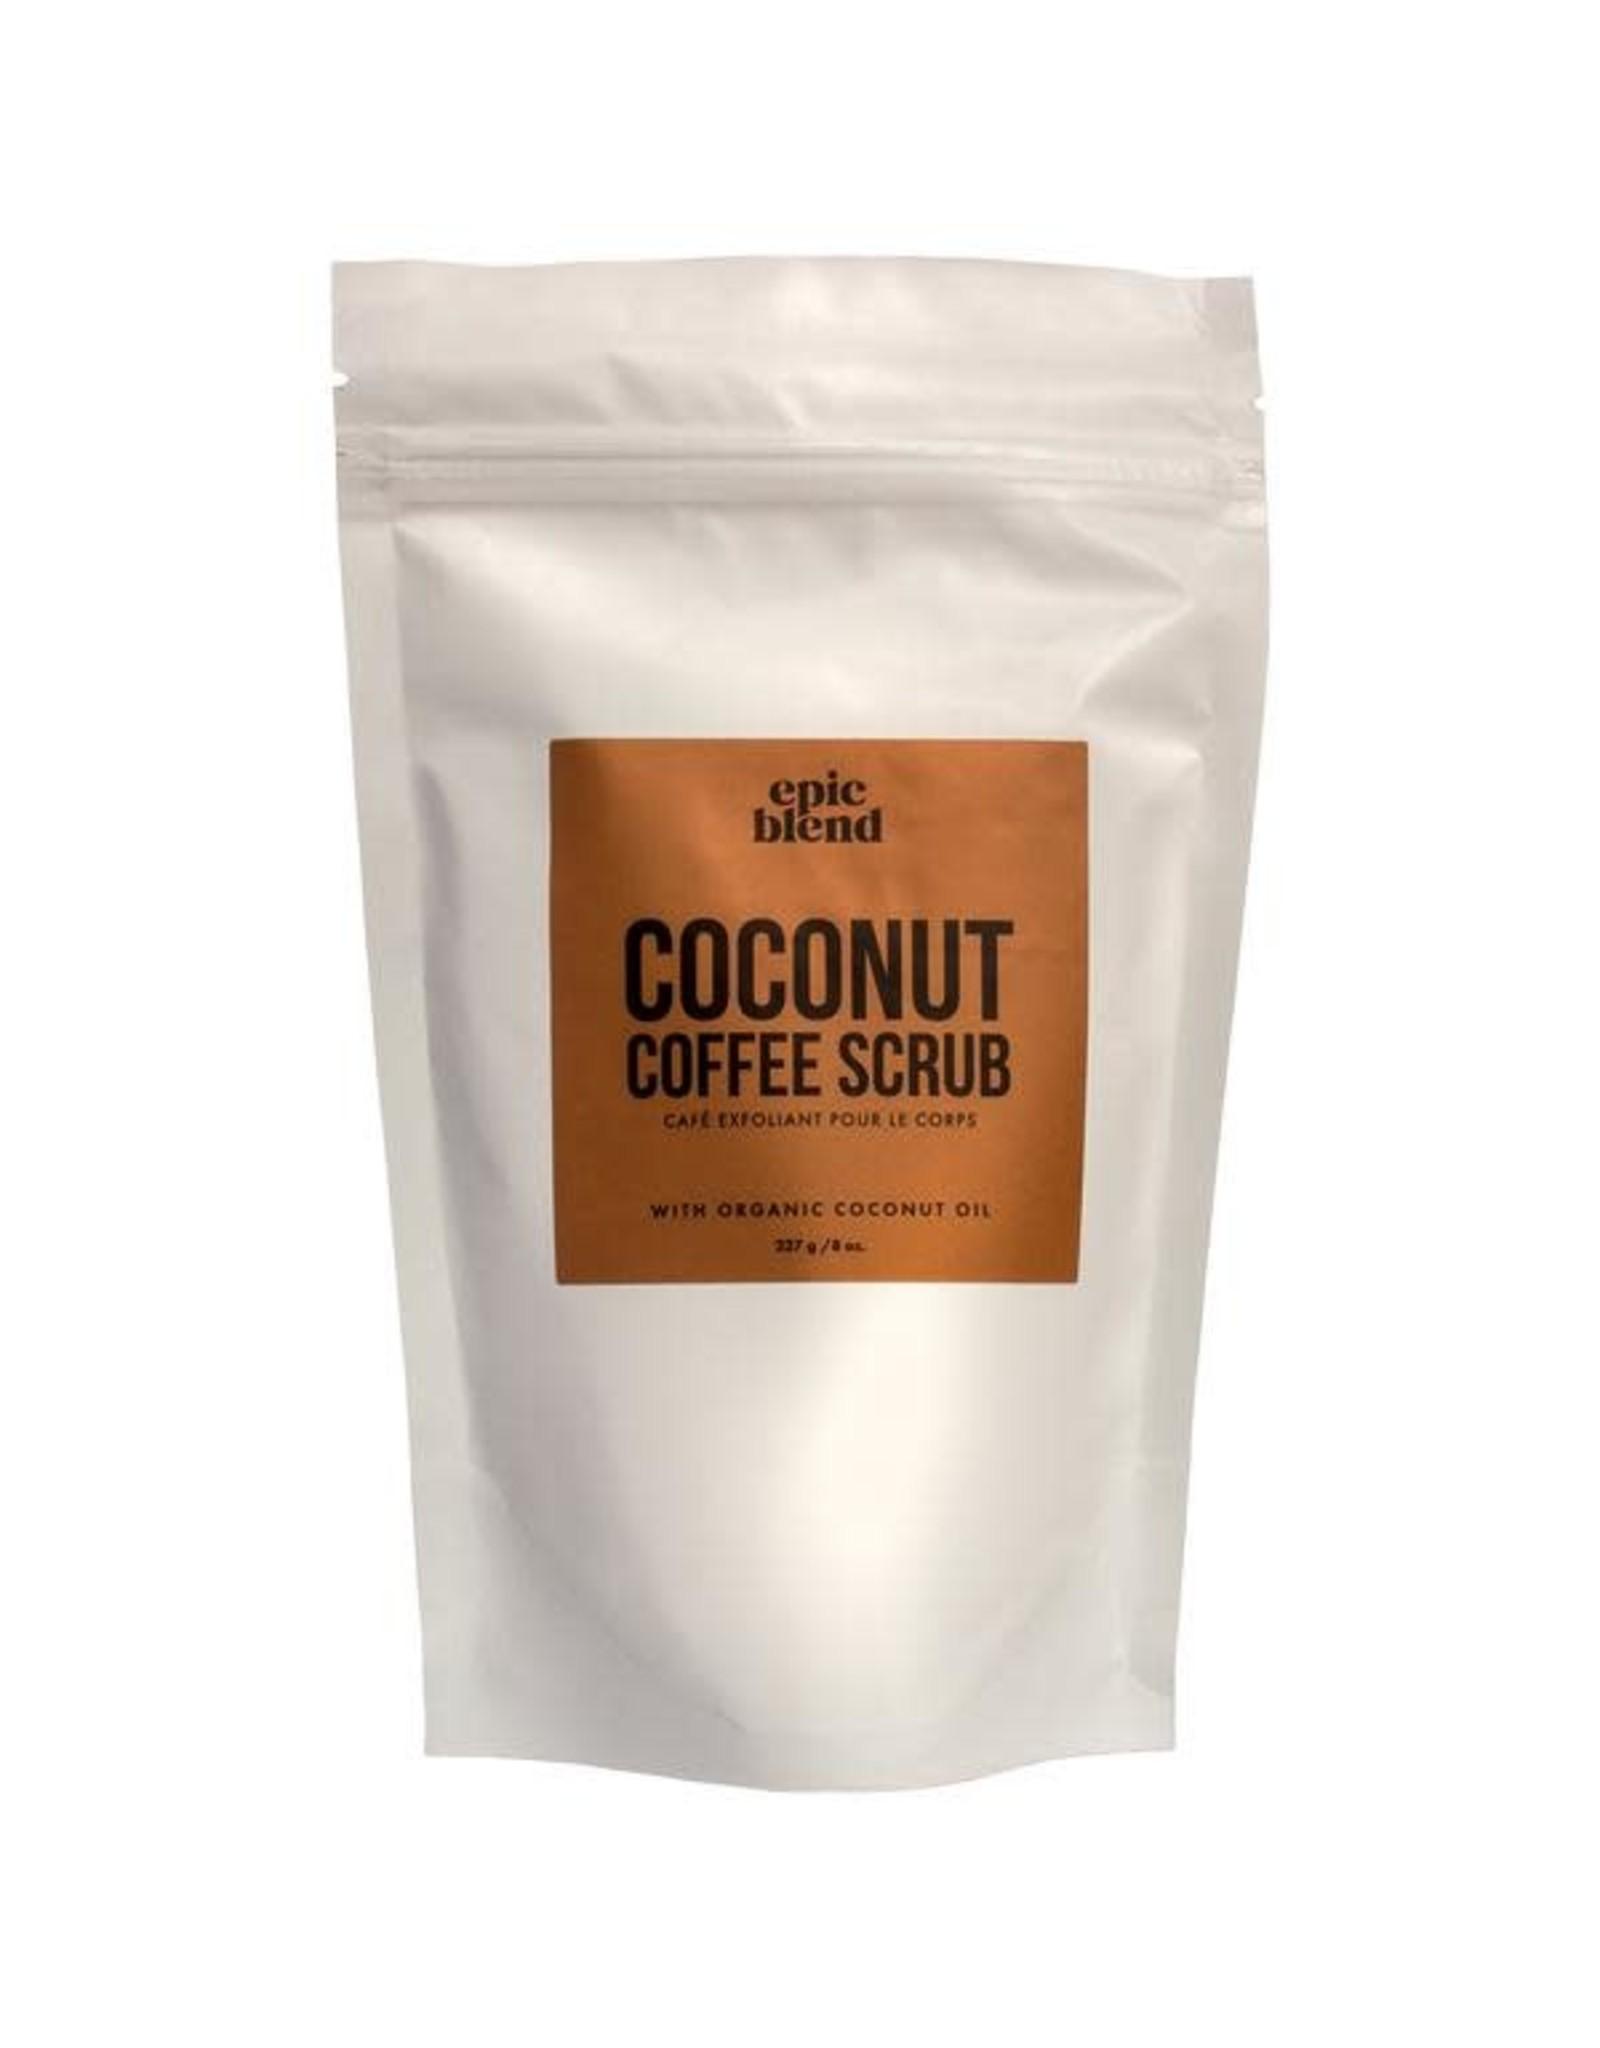 Epic Blend Coconut Coffee Scrub